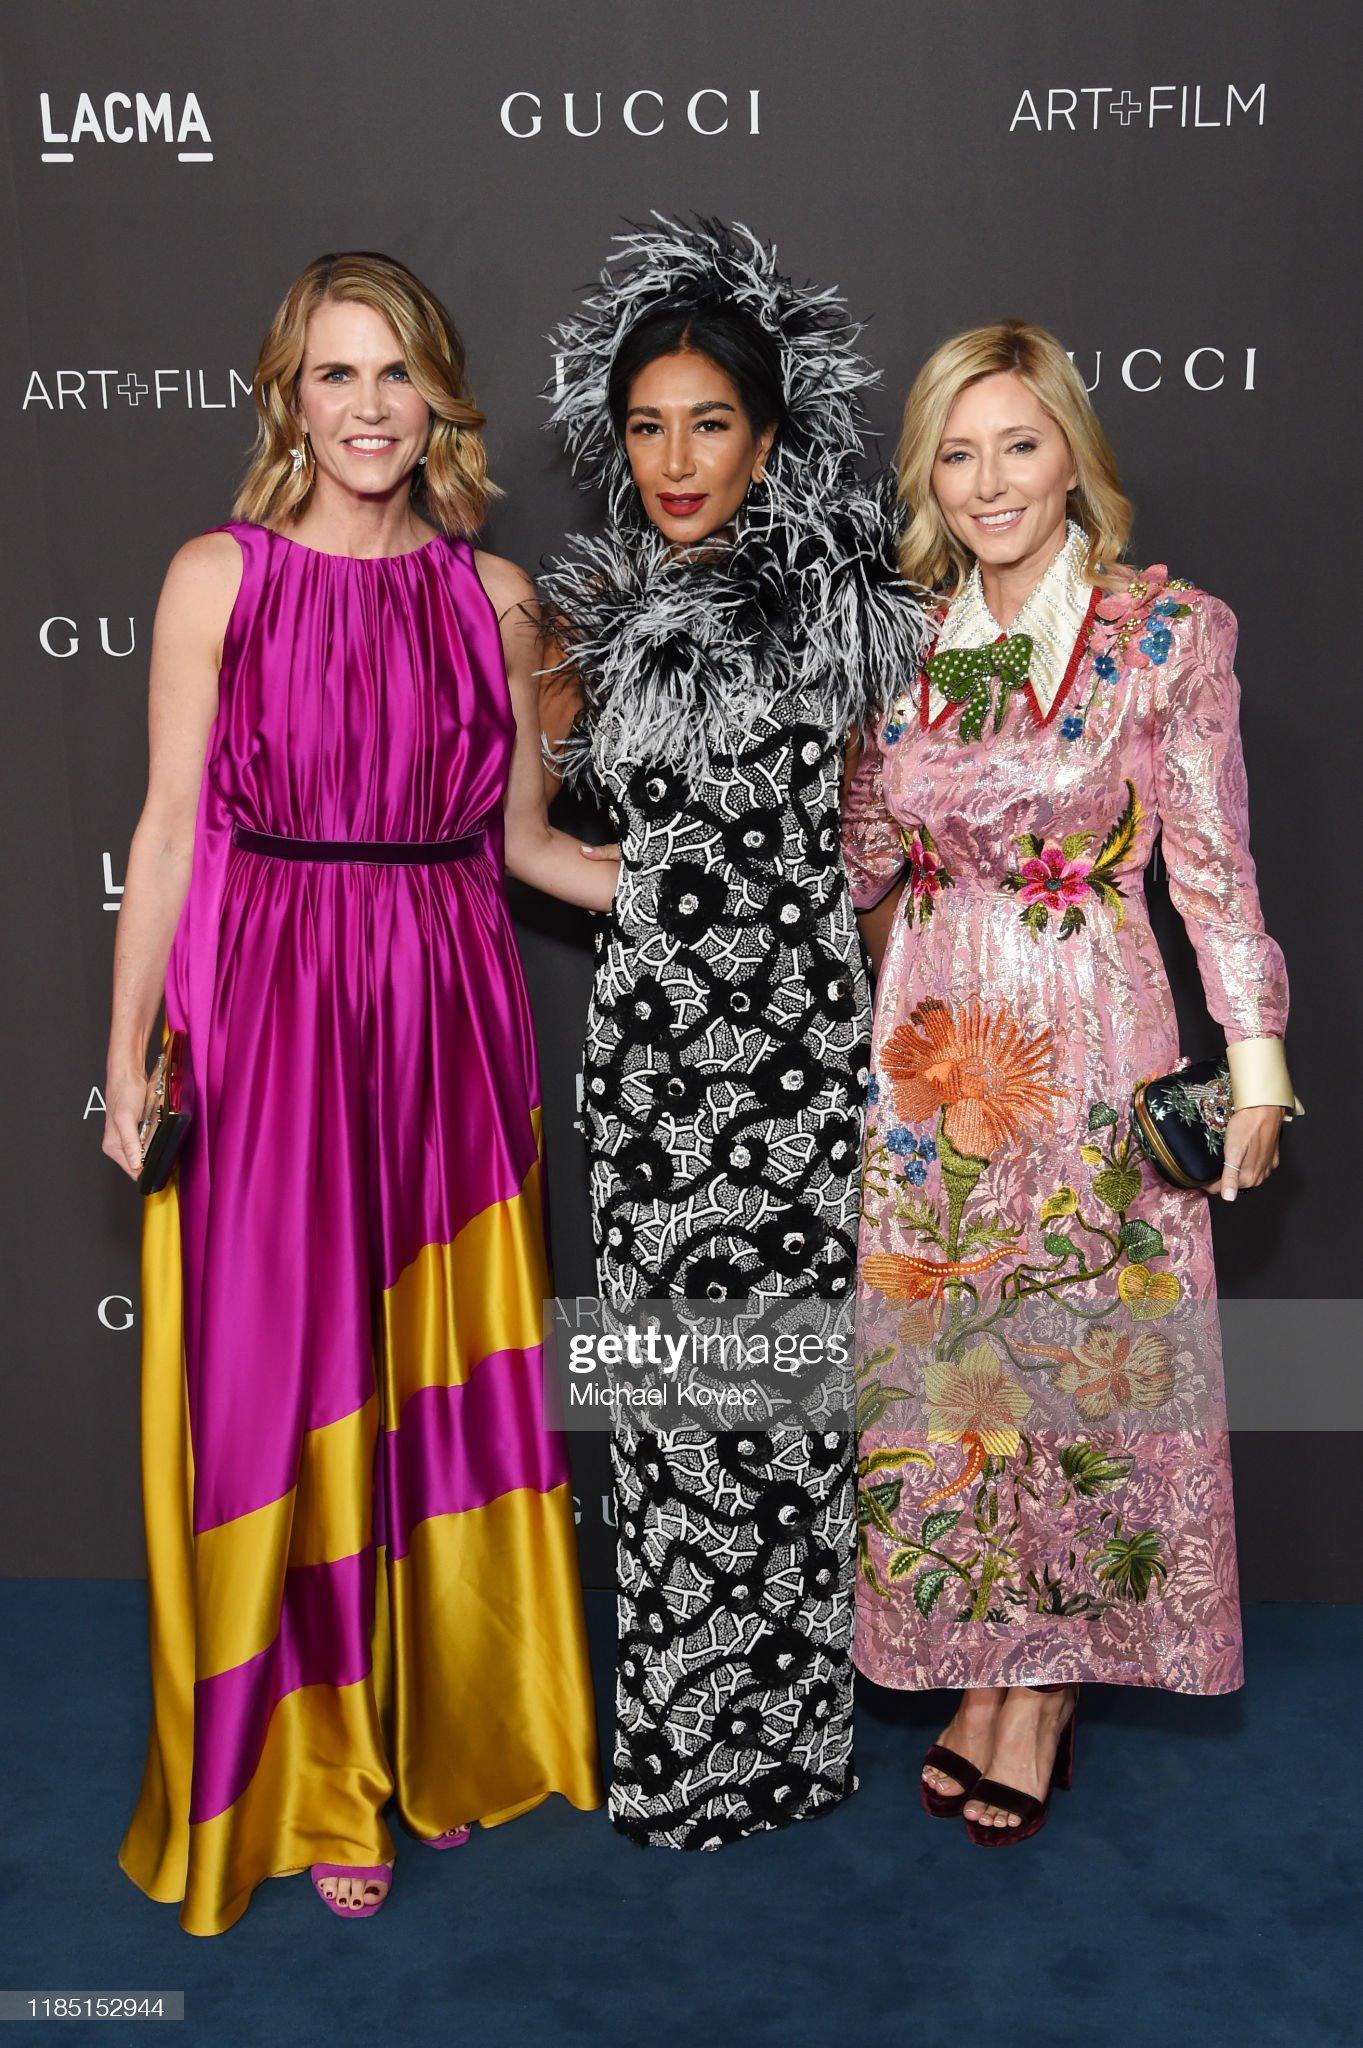 2019 LACMA Art + Film Gala Honoring Betye Saar And Alfonso Cuarón Presented By Gucci - Red Carpet : News Photo